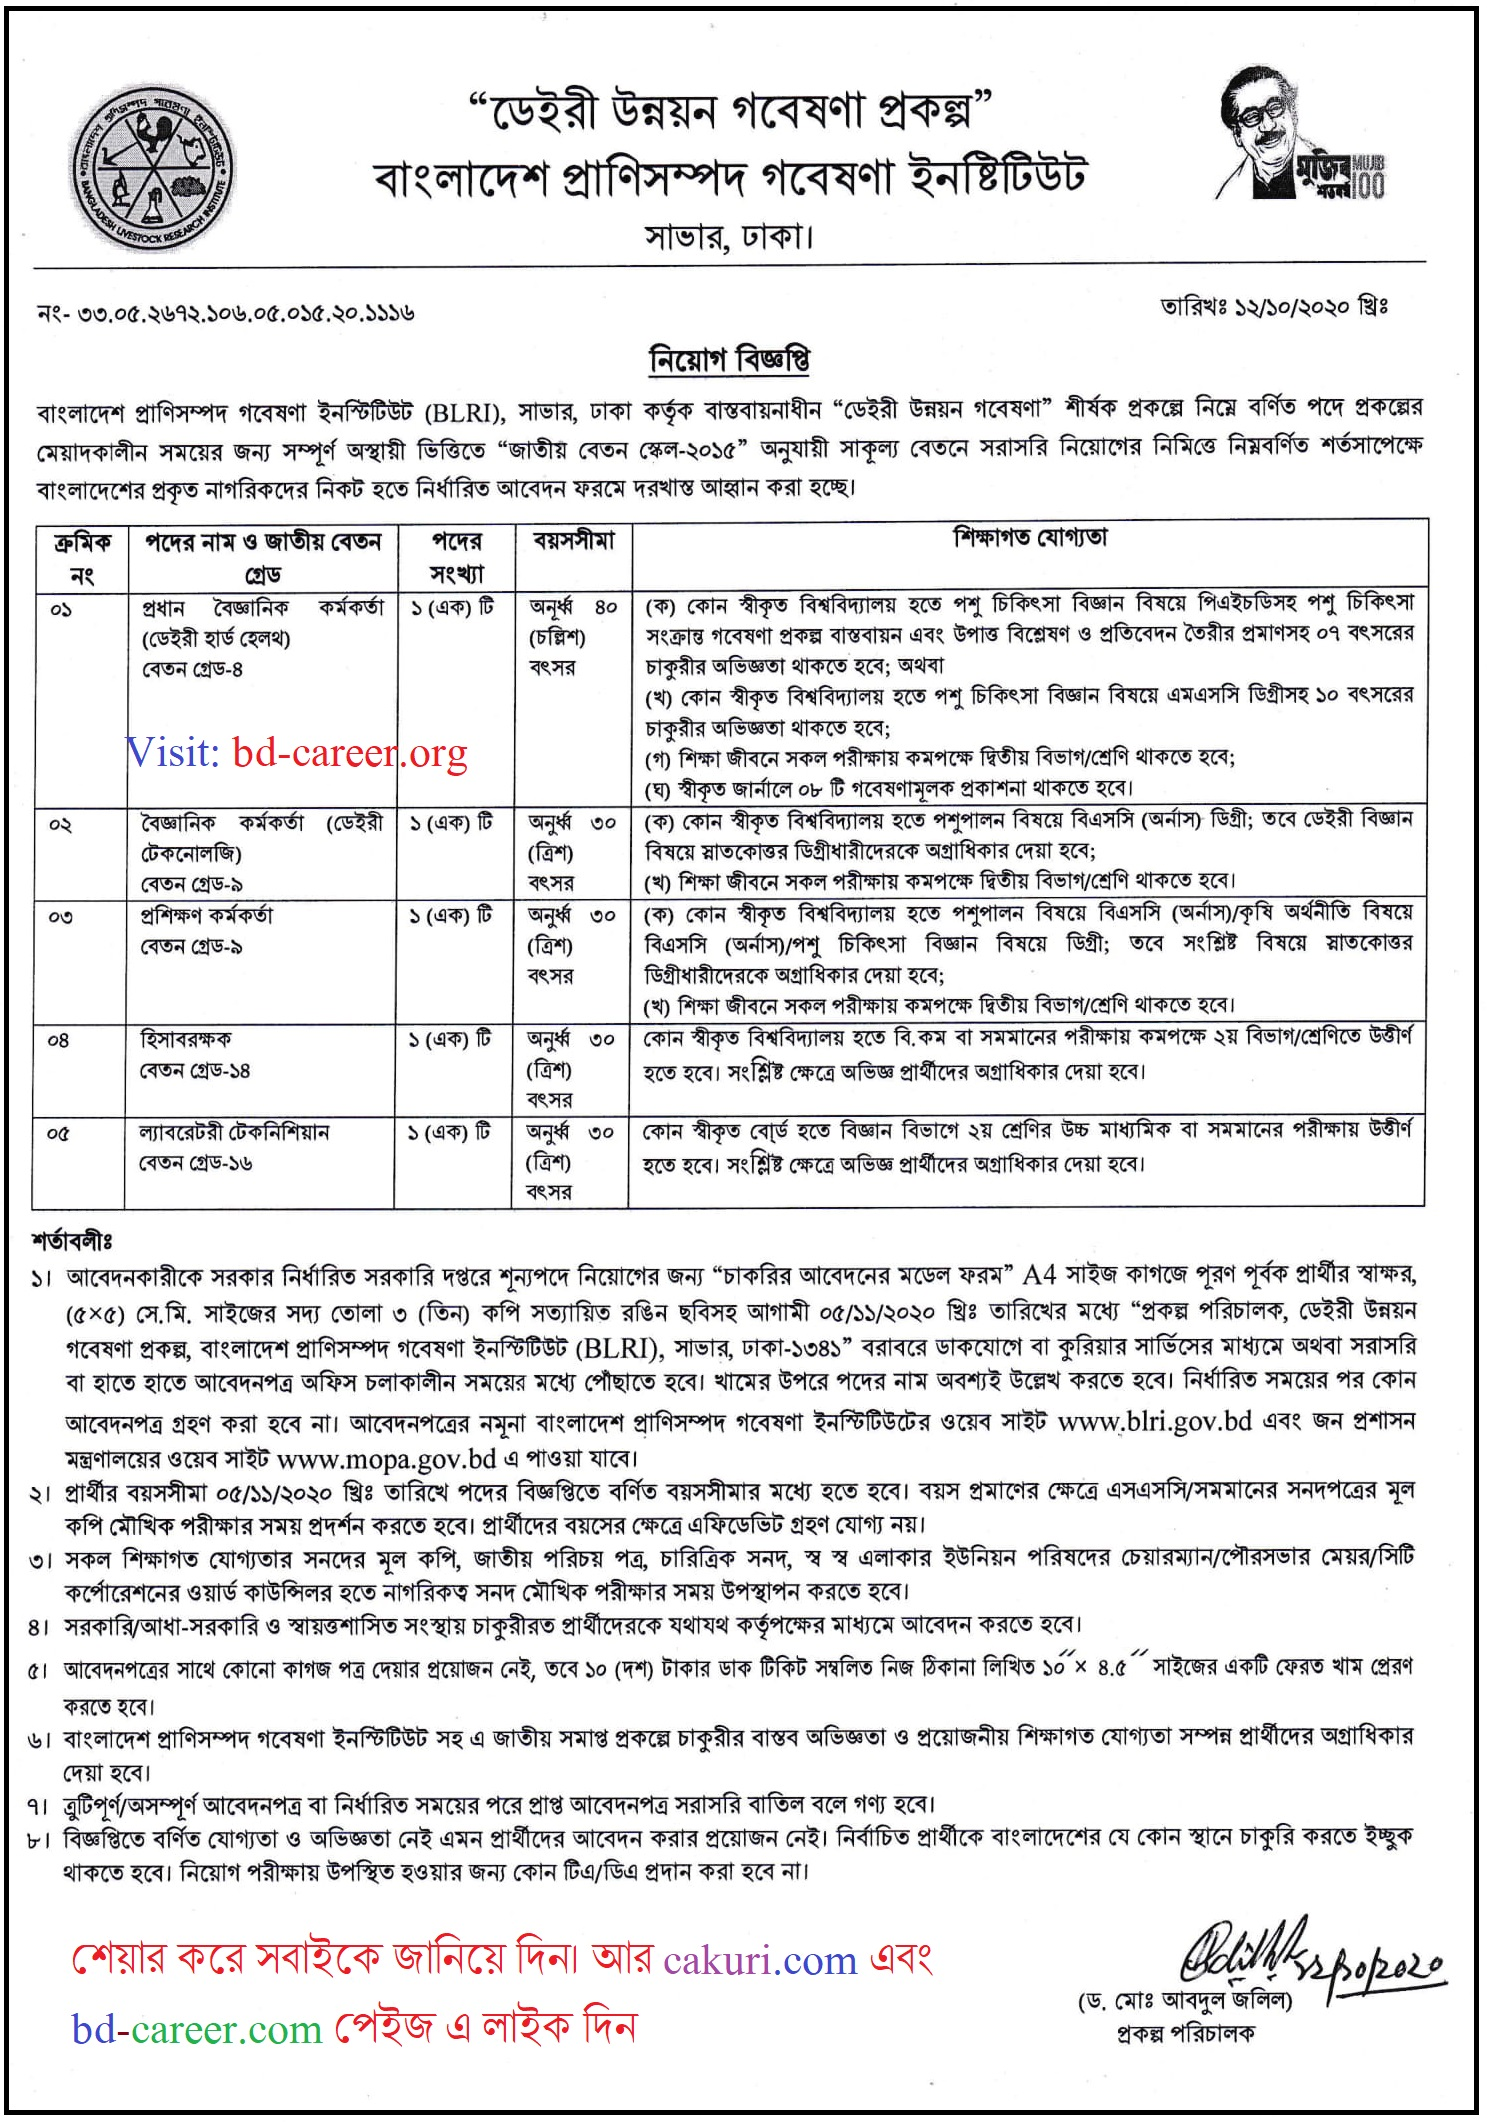 Bangladesh Livestock Research Institute BLRI Job Circular 2020